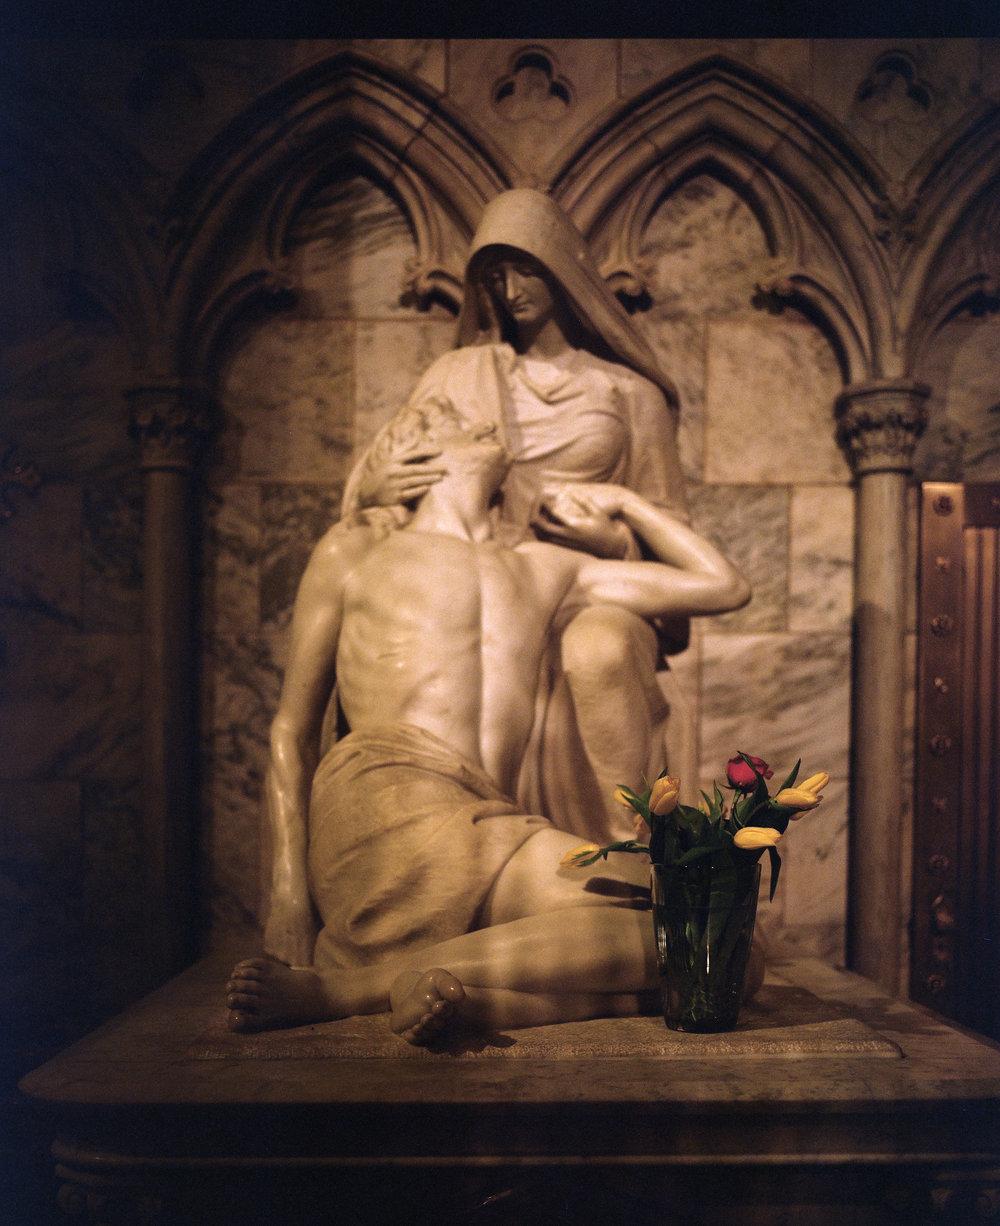 Saint Patrick's Cathedral, NYC, 2017